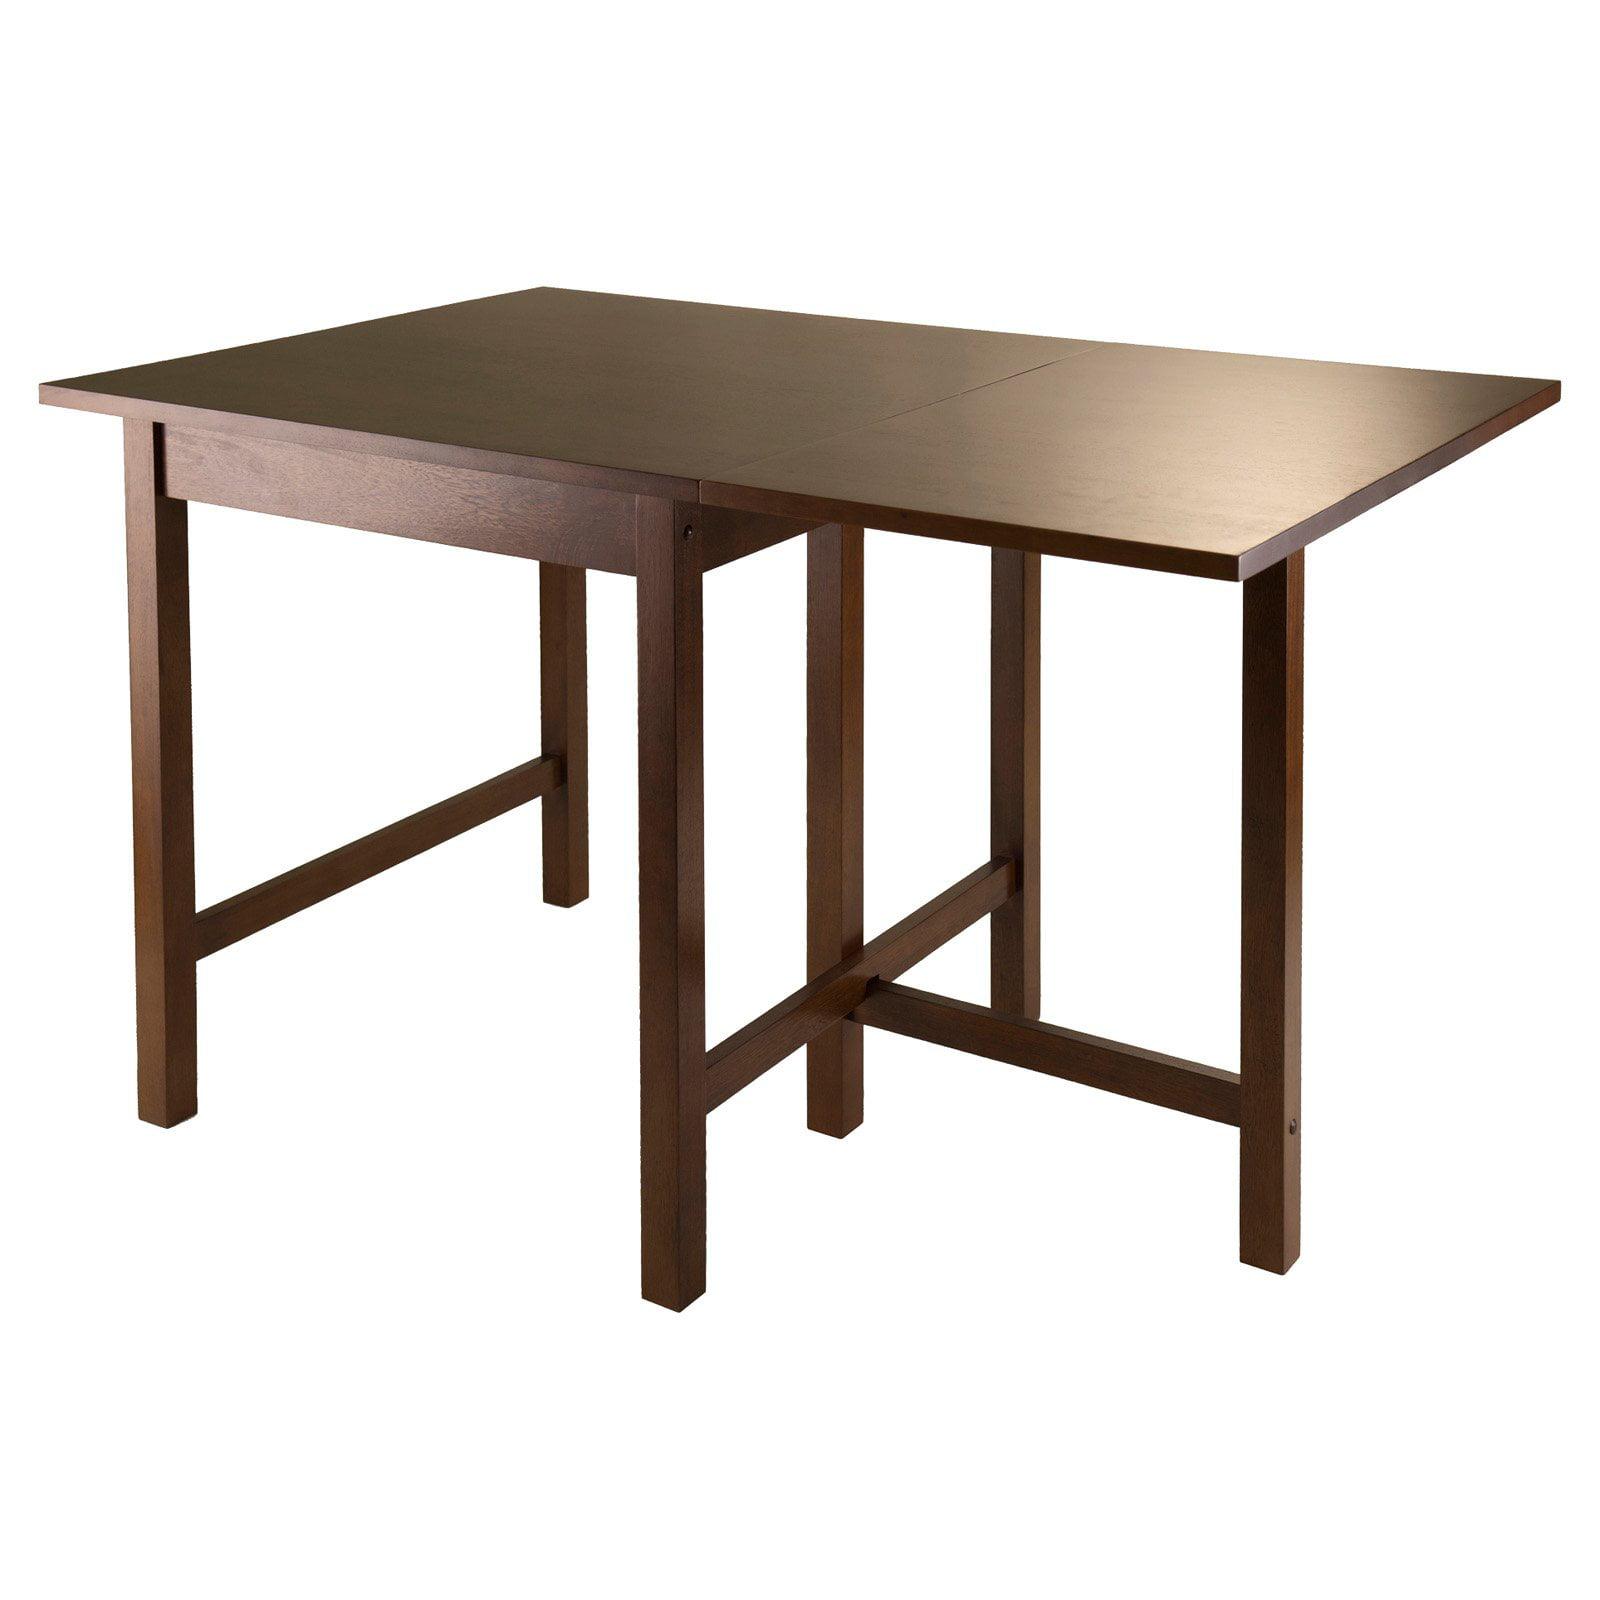 Lynden Drop Leaf Dining Table, Antique Walnut   Walmart.com